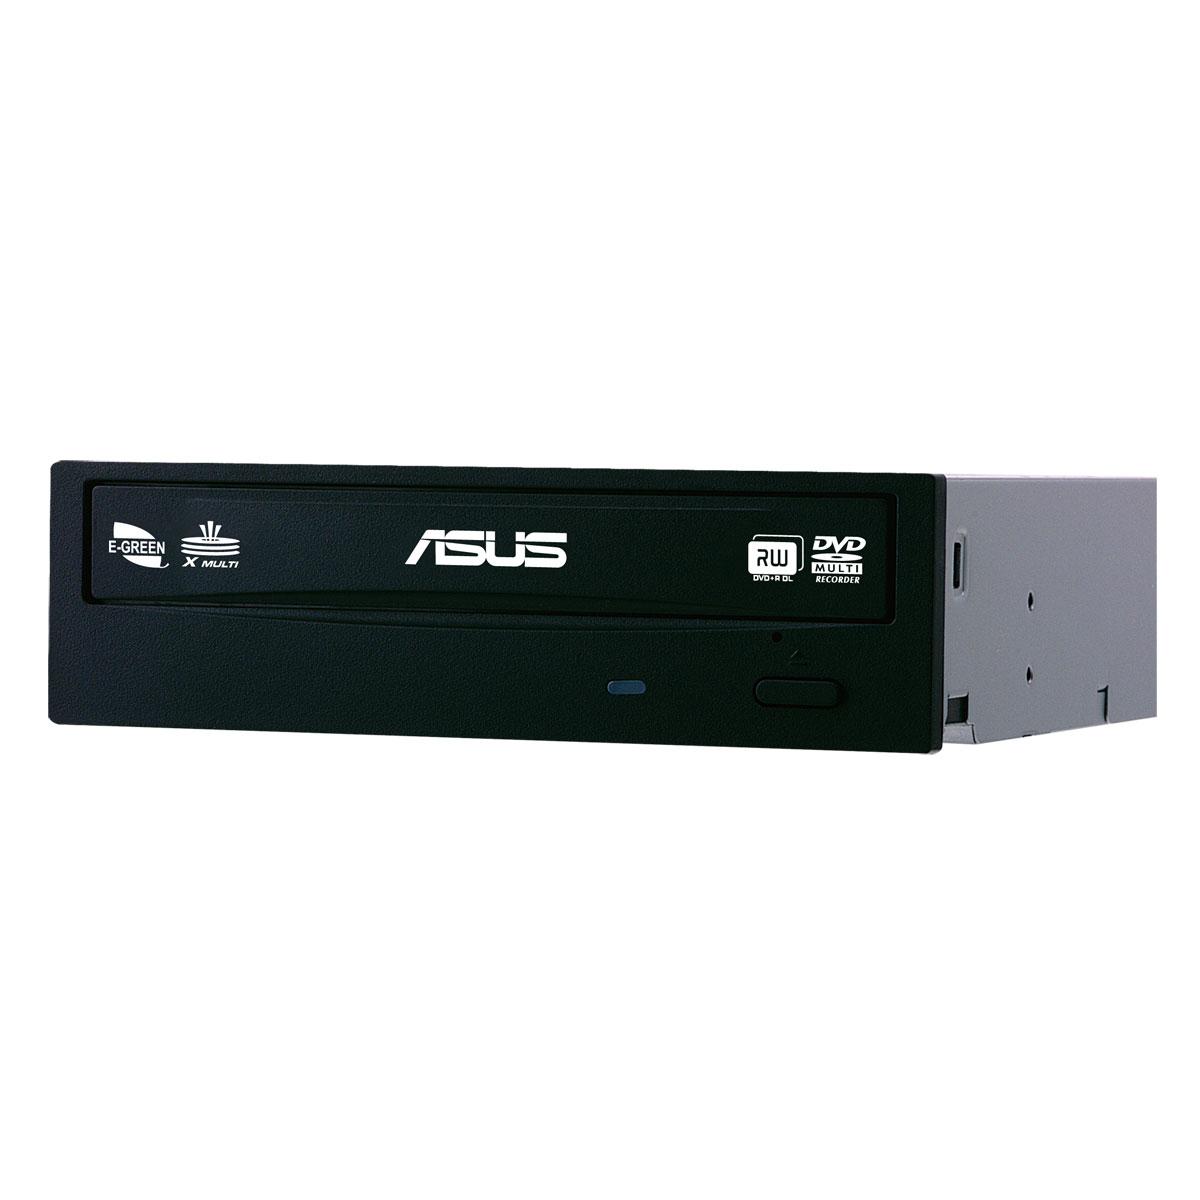 Lecteur graveur ASUS DRW-24B5ST (bulk) DVD(+/-)RW/RAM 24/8/24/6/5x DL(+/-) 8/8x CD-RW 48/24/48x SATA - Noir (bulk)